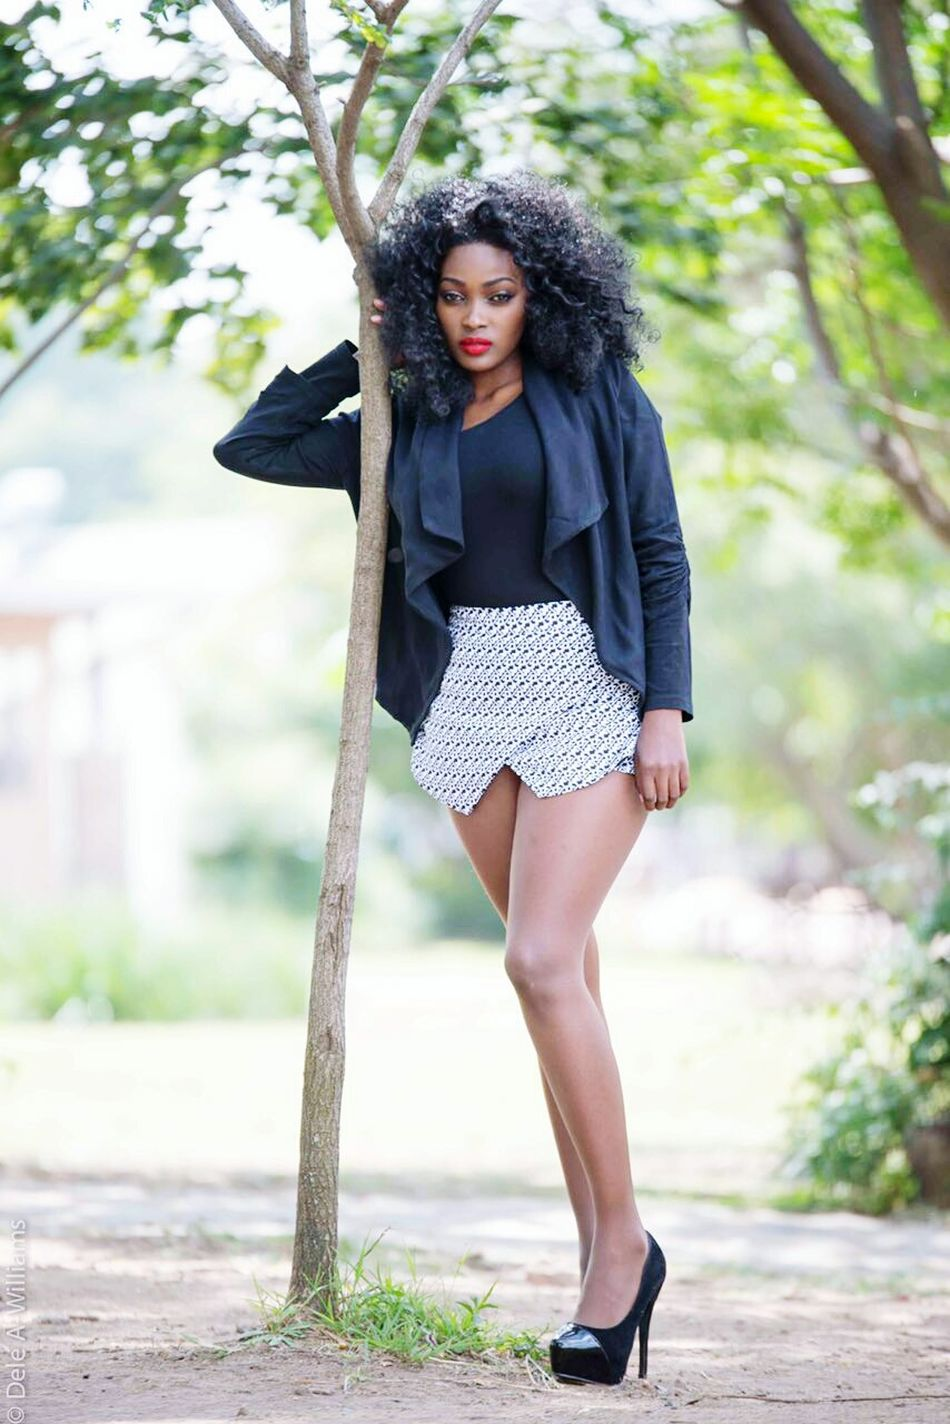 Beautiful stock photos of lippen, beauty, beautiful people, fashion, full length